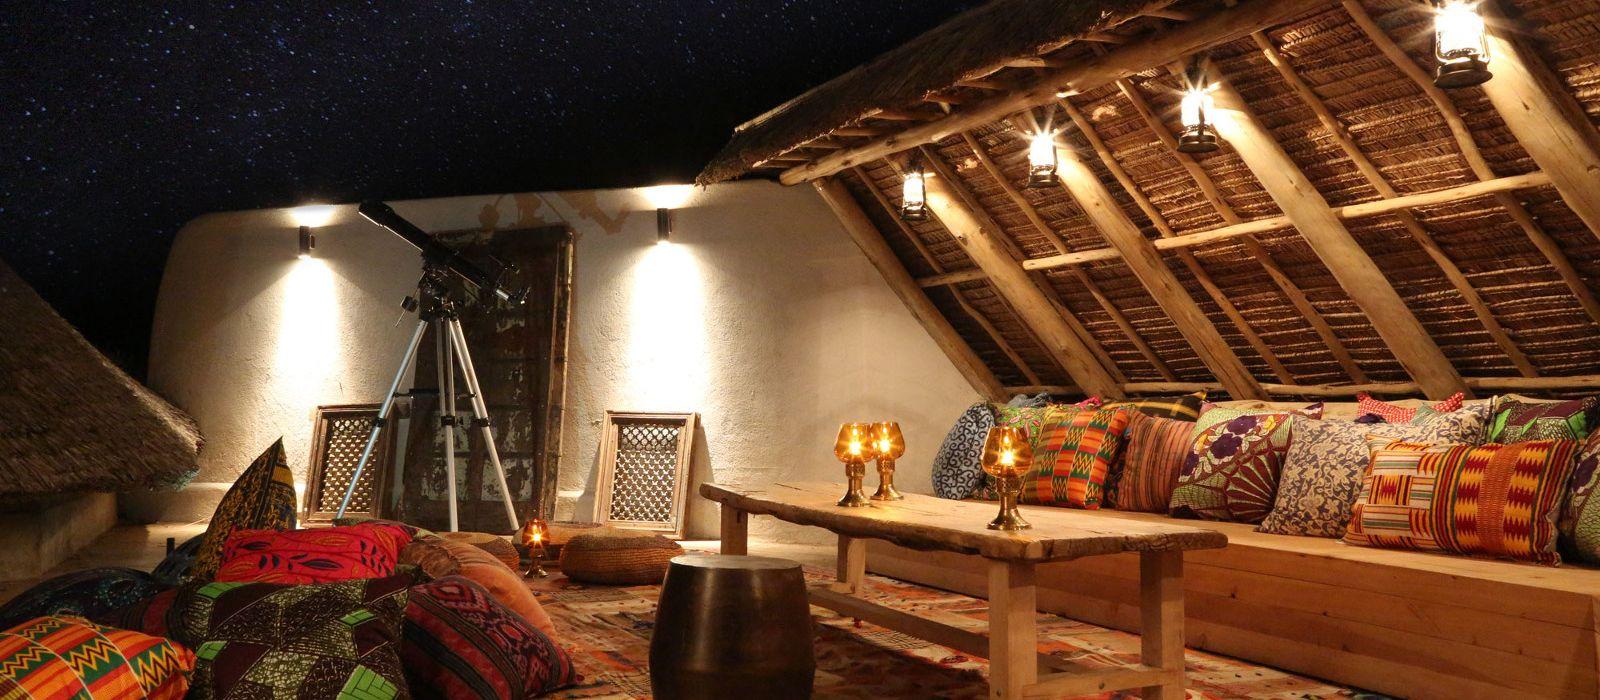 Hotel Finch Hattons Kenia